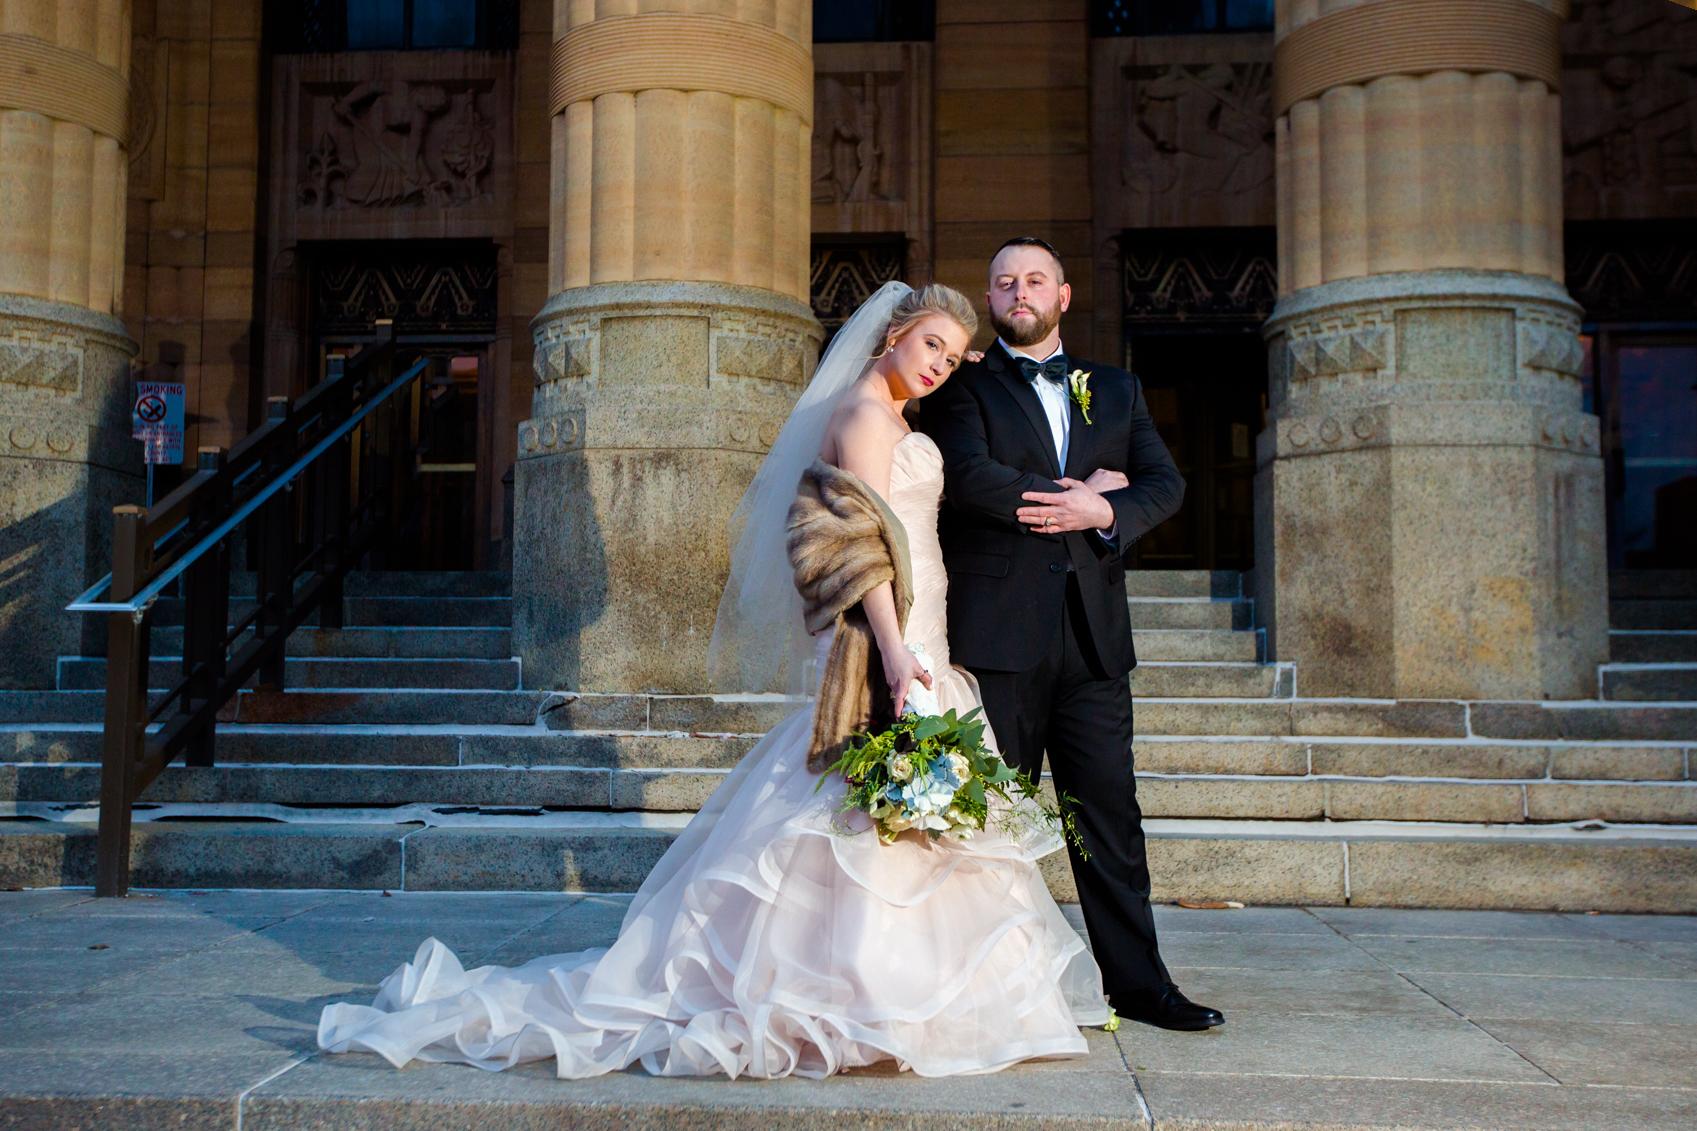 Alyssa Klein & Chris Coehn | Hotel At Lafayette Buffalo, NY